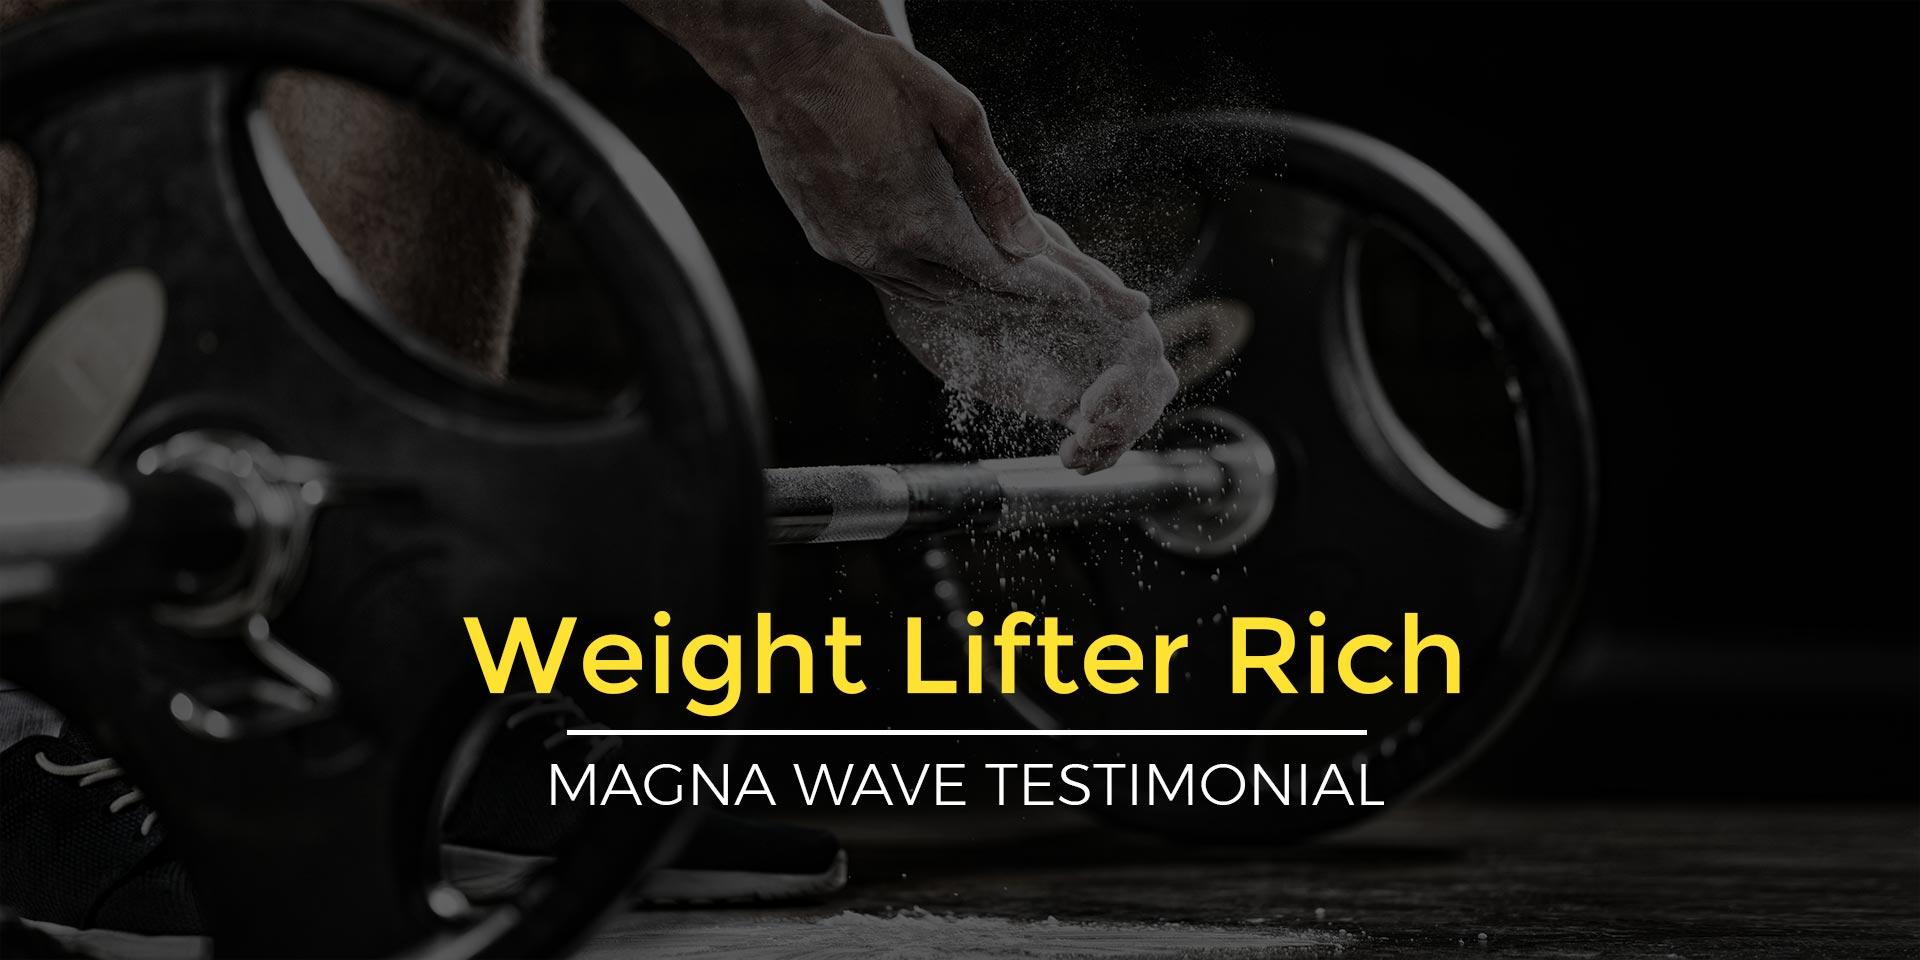 Weight Lifter Rich - Magna Wave Testimonial